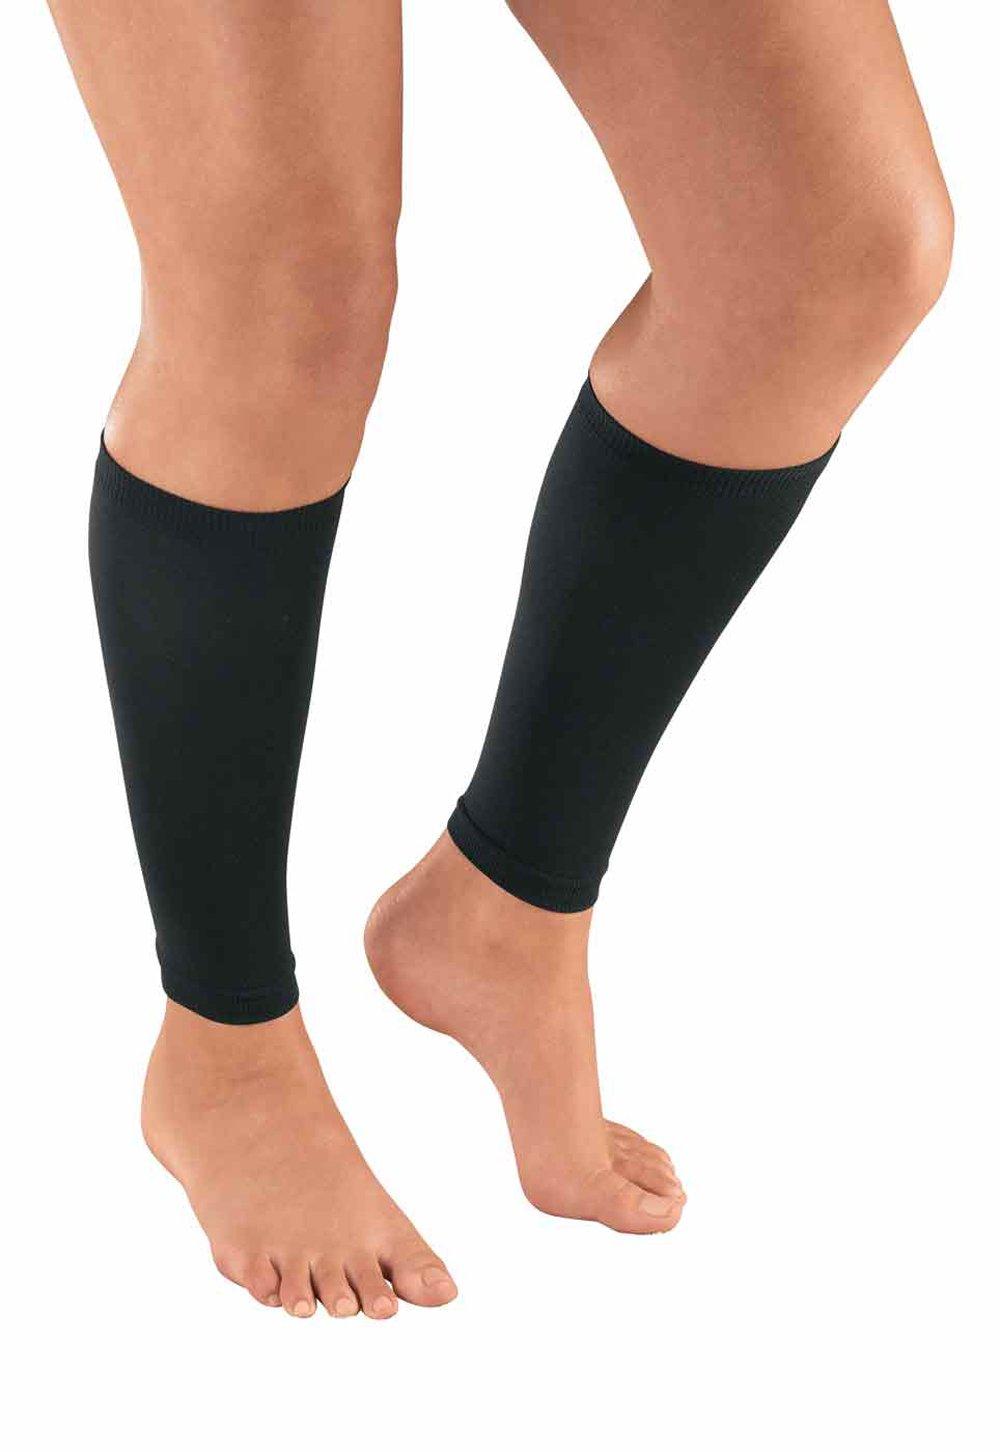 Calf Compression Sleeves, 20-30 mmHg